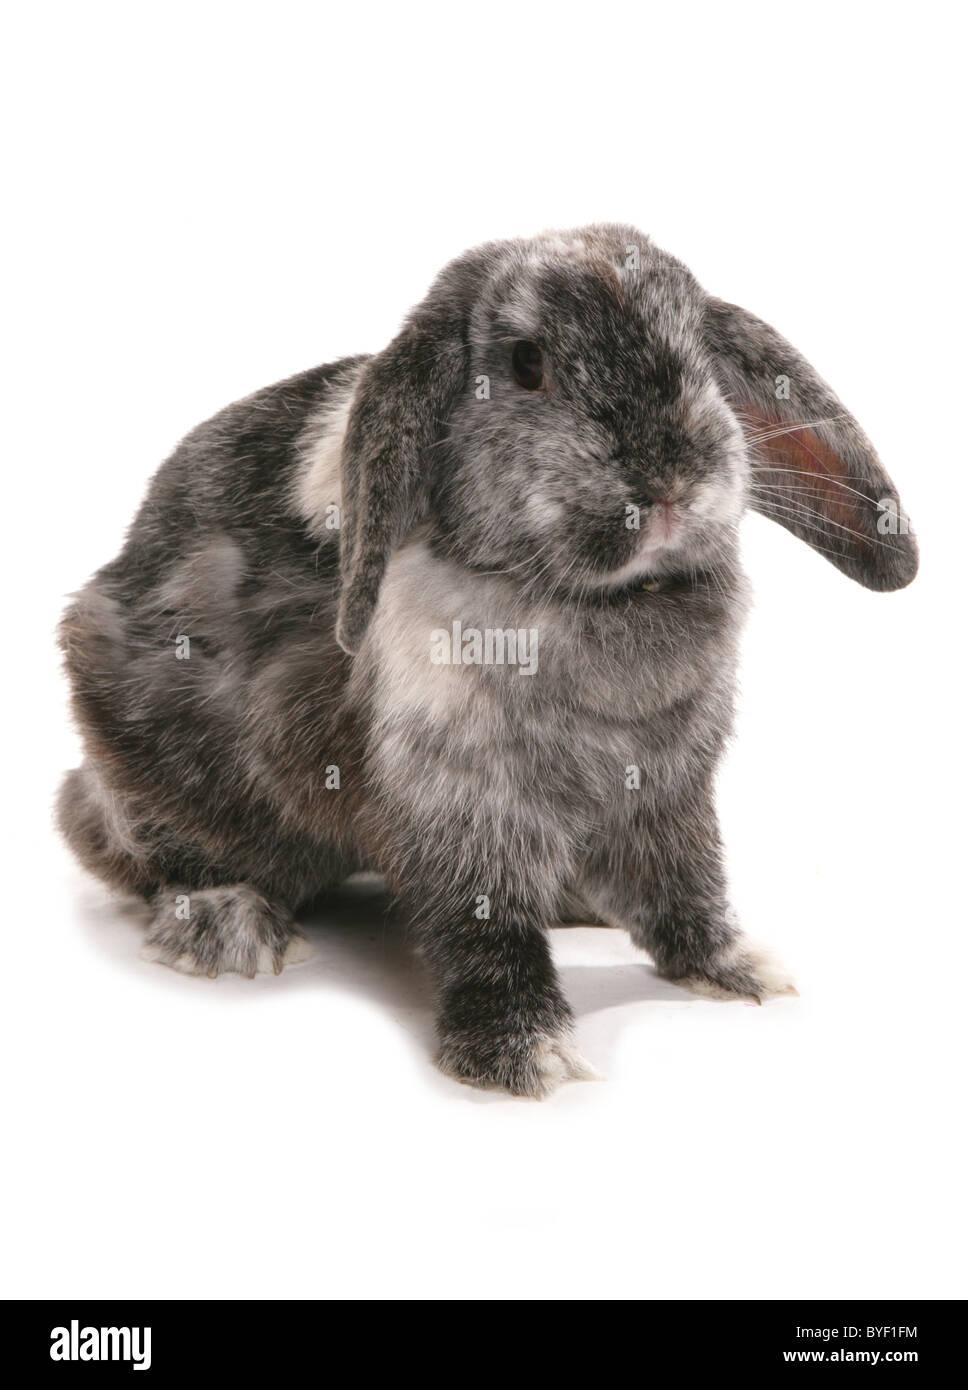 Hibou lop rabbit studio Photo Stock